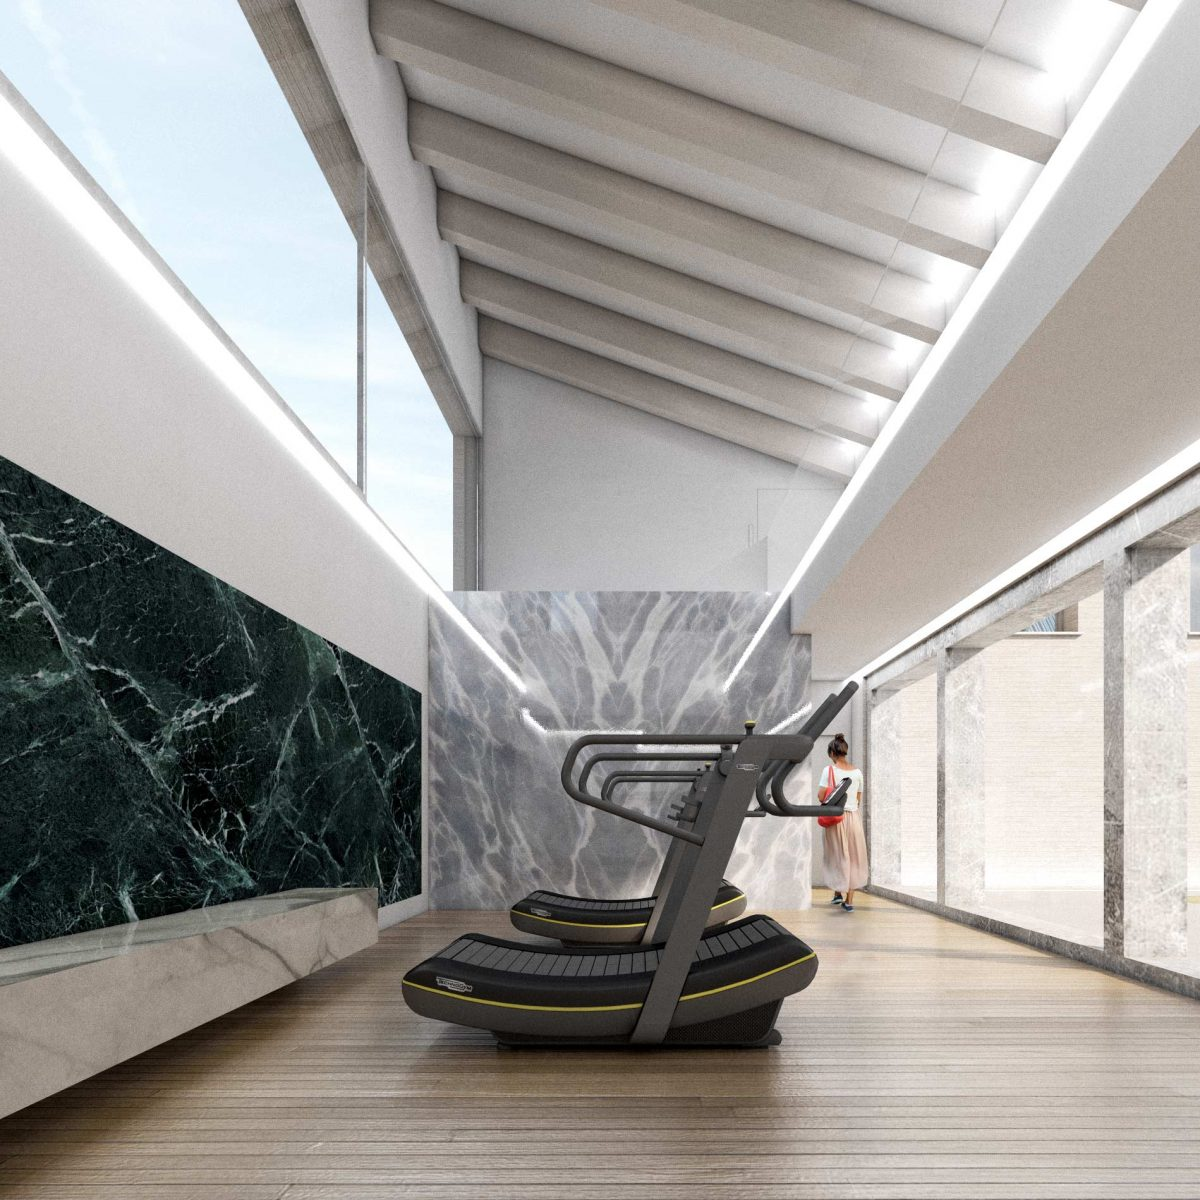 interior rendering - Technogym Skillmill gym